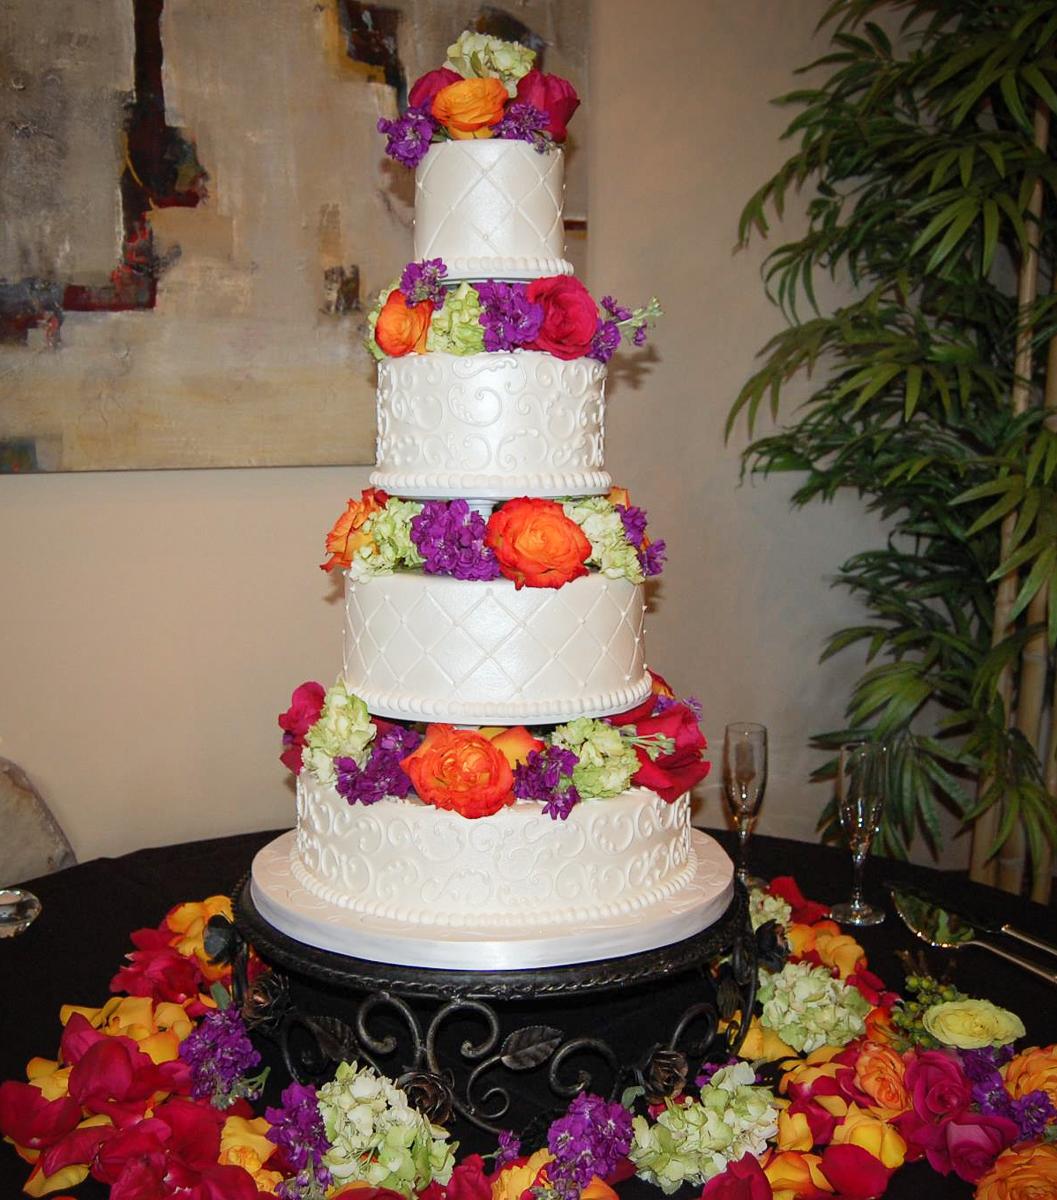 CARMENS_floral_designs_wedding_flowers_houston_013.JPG